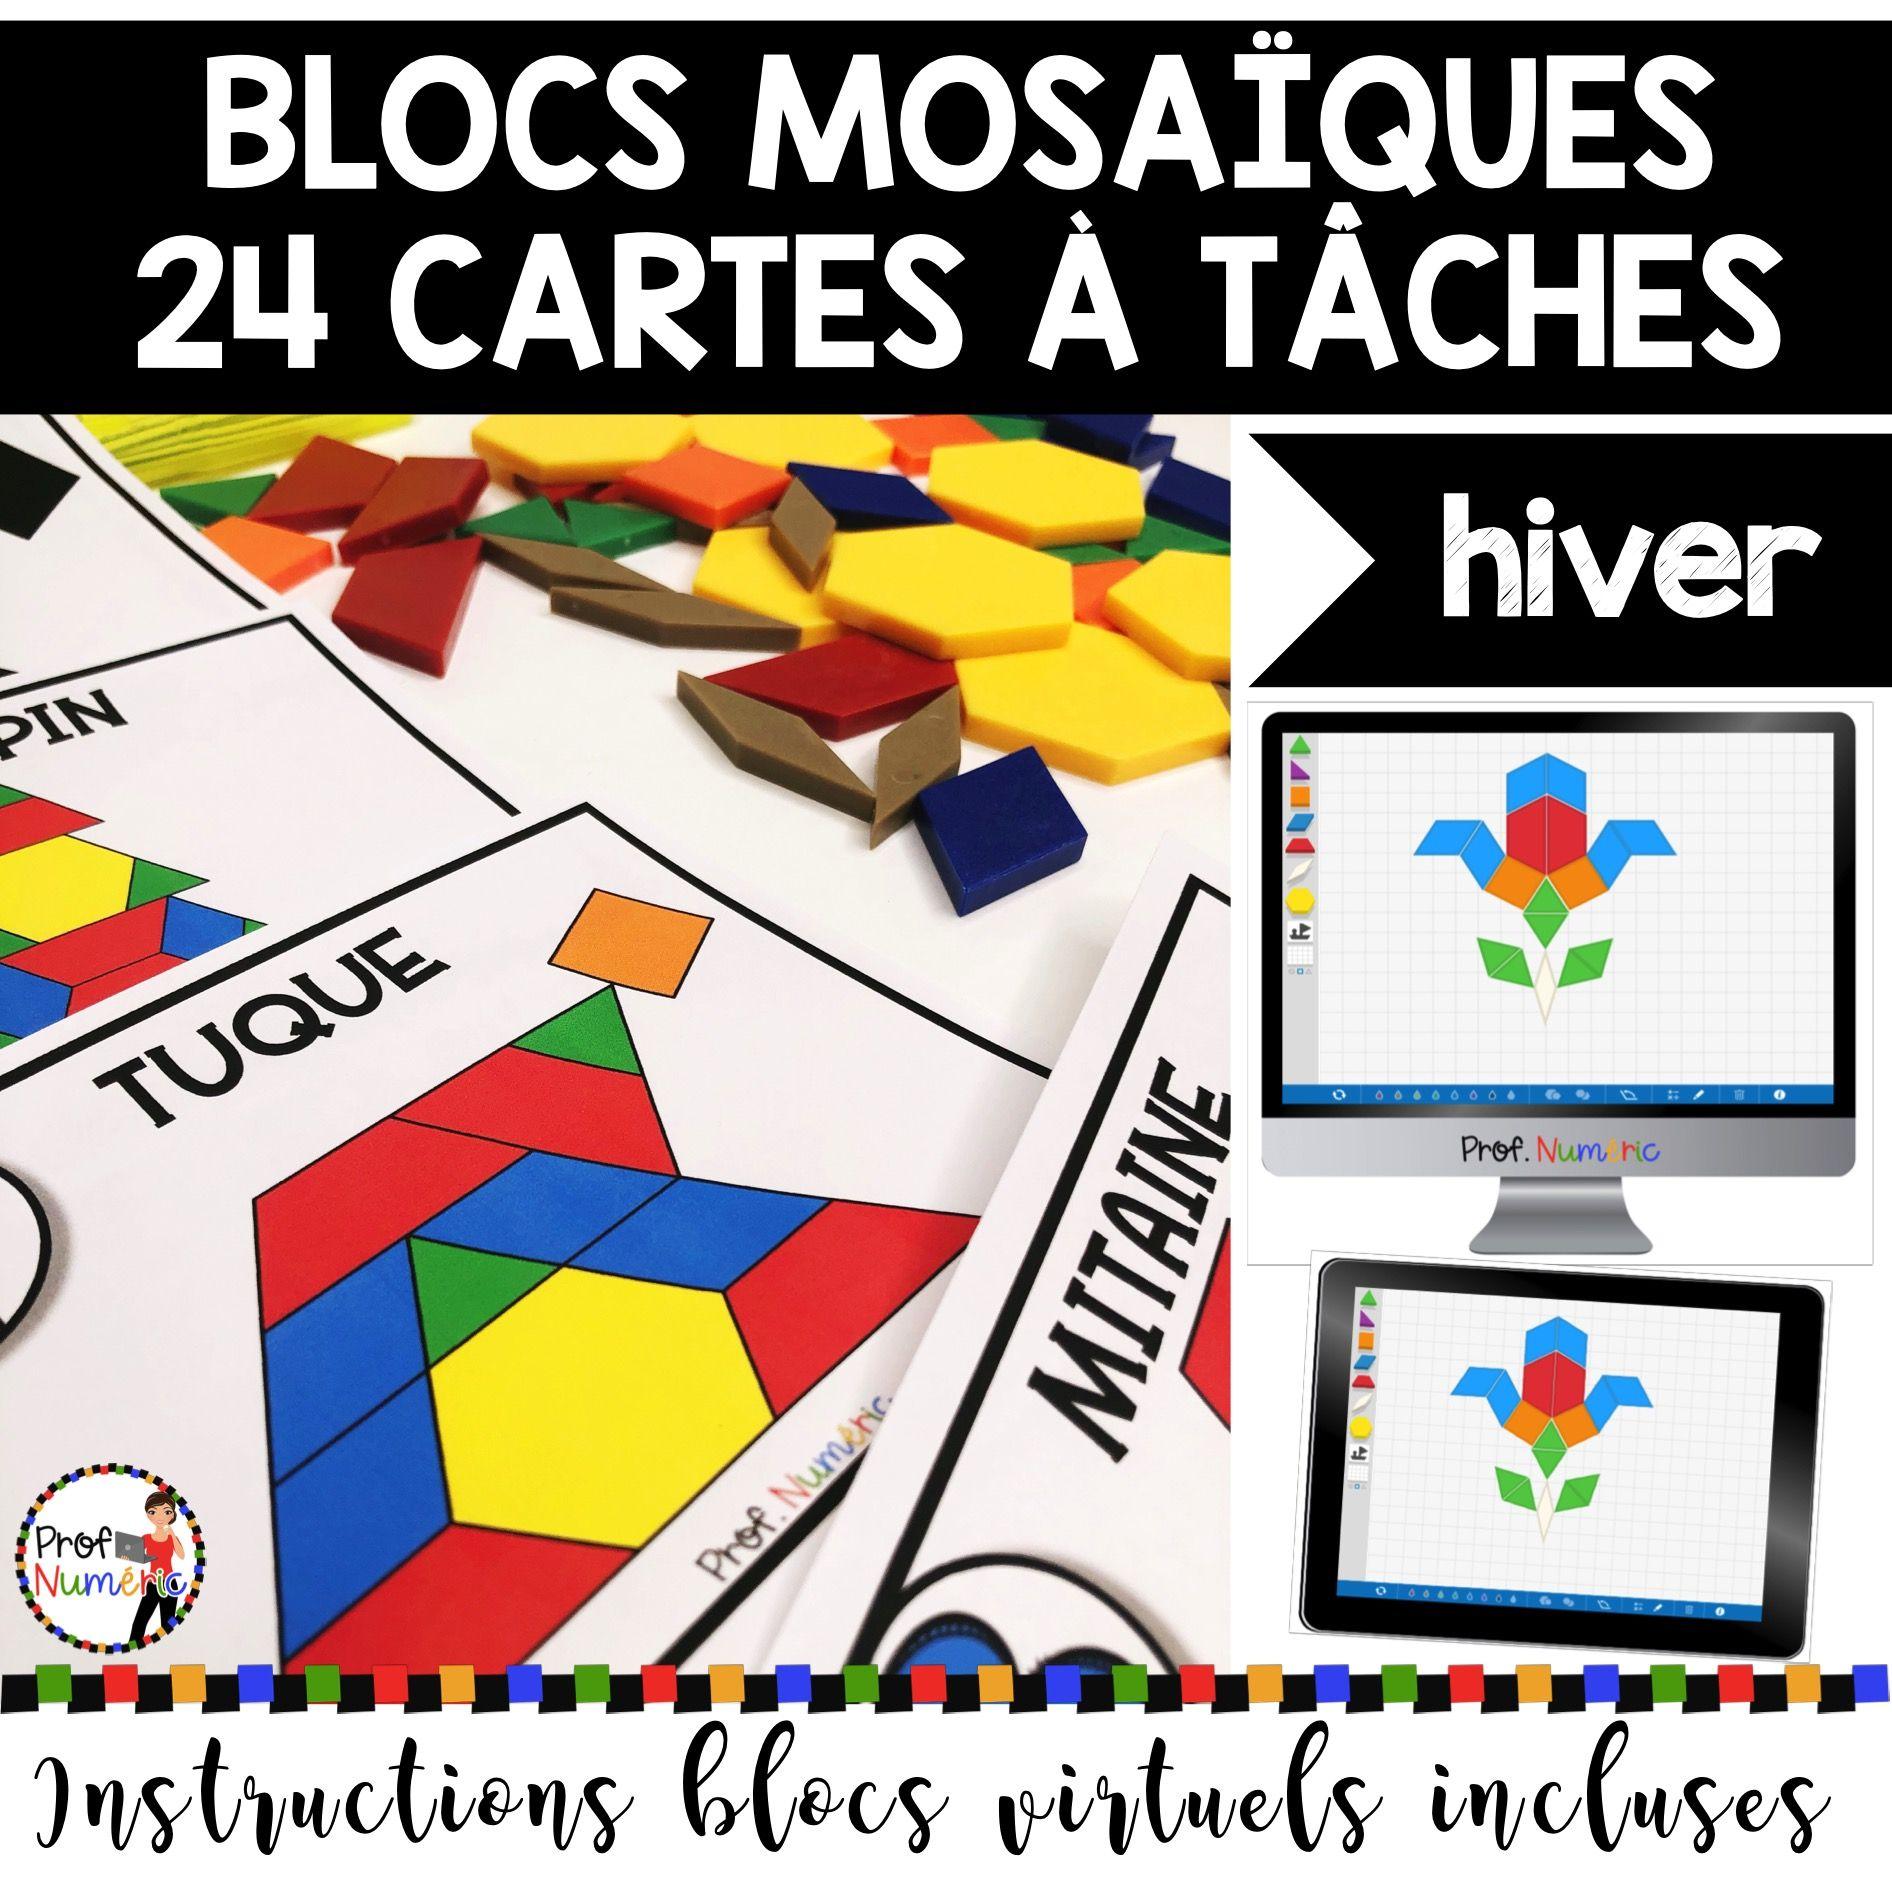 BLOCS MOSAÏQUES – 24 Cartes à Tâches (imprimer/virtuel) THÈME HIVER